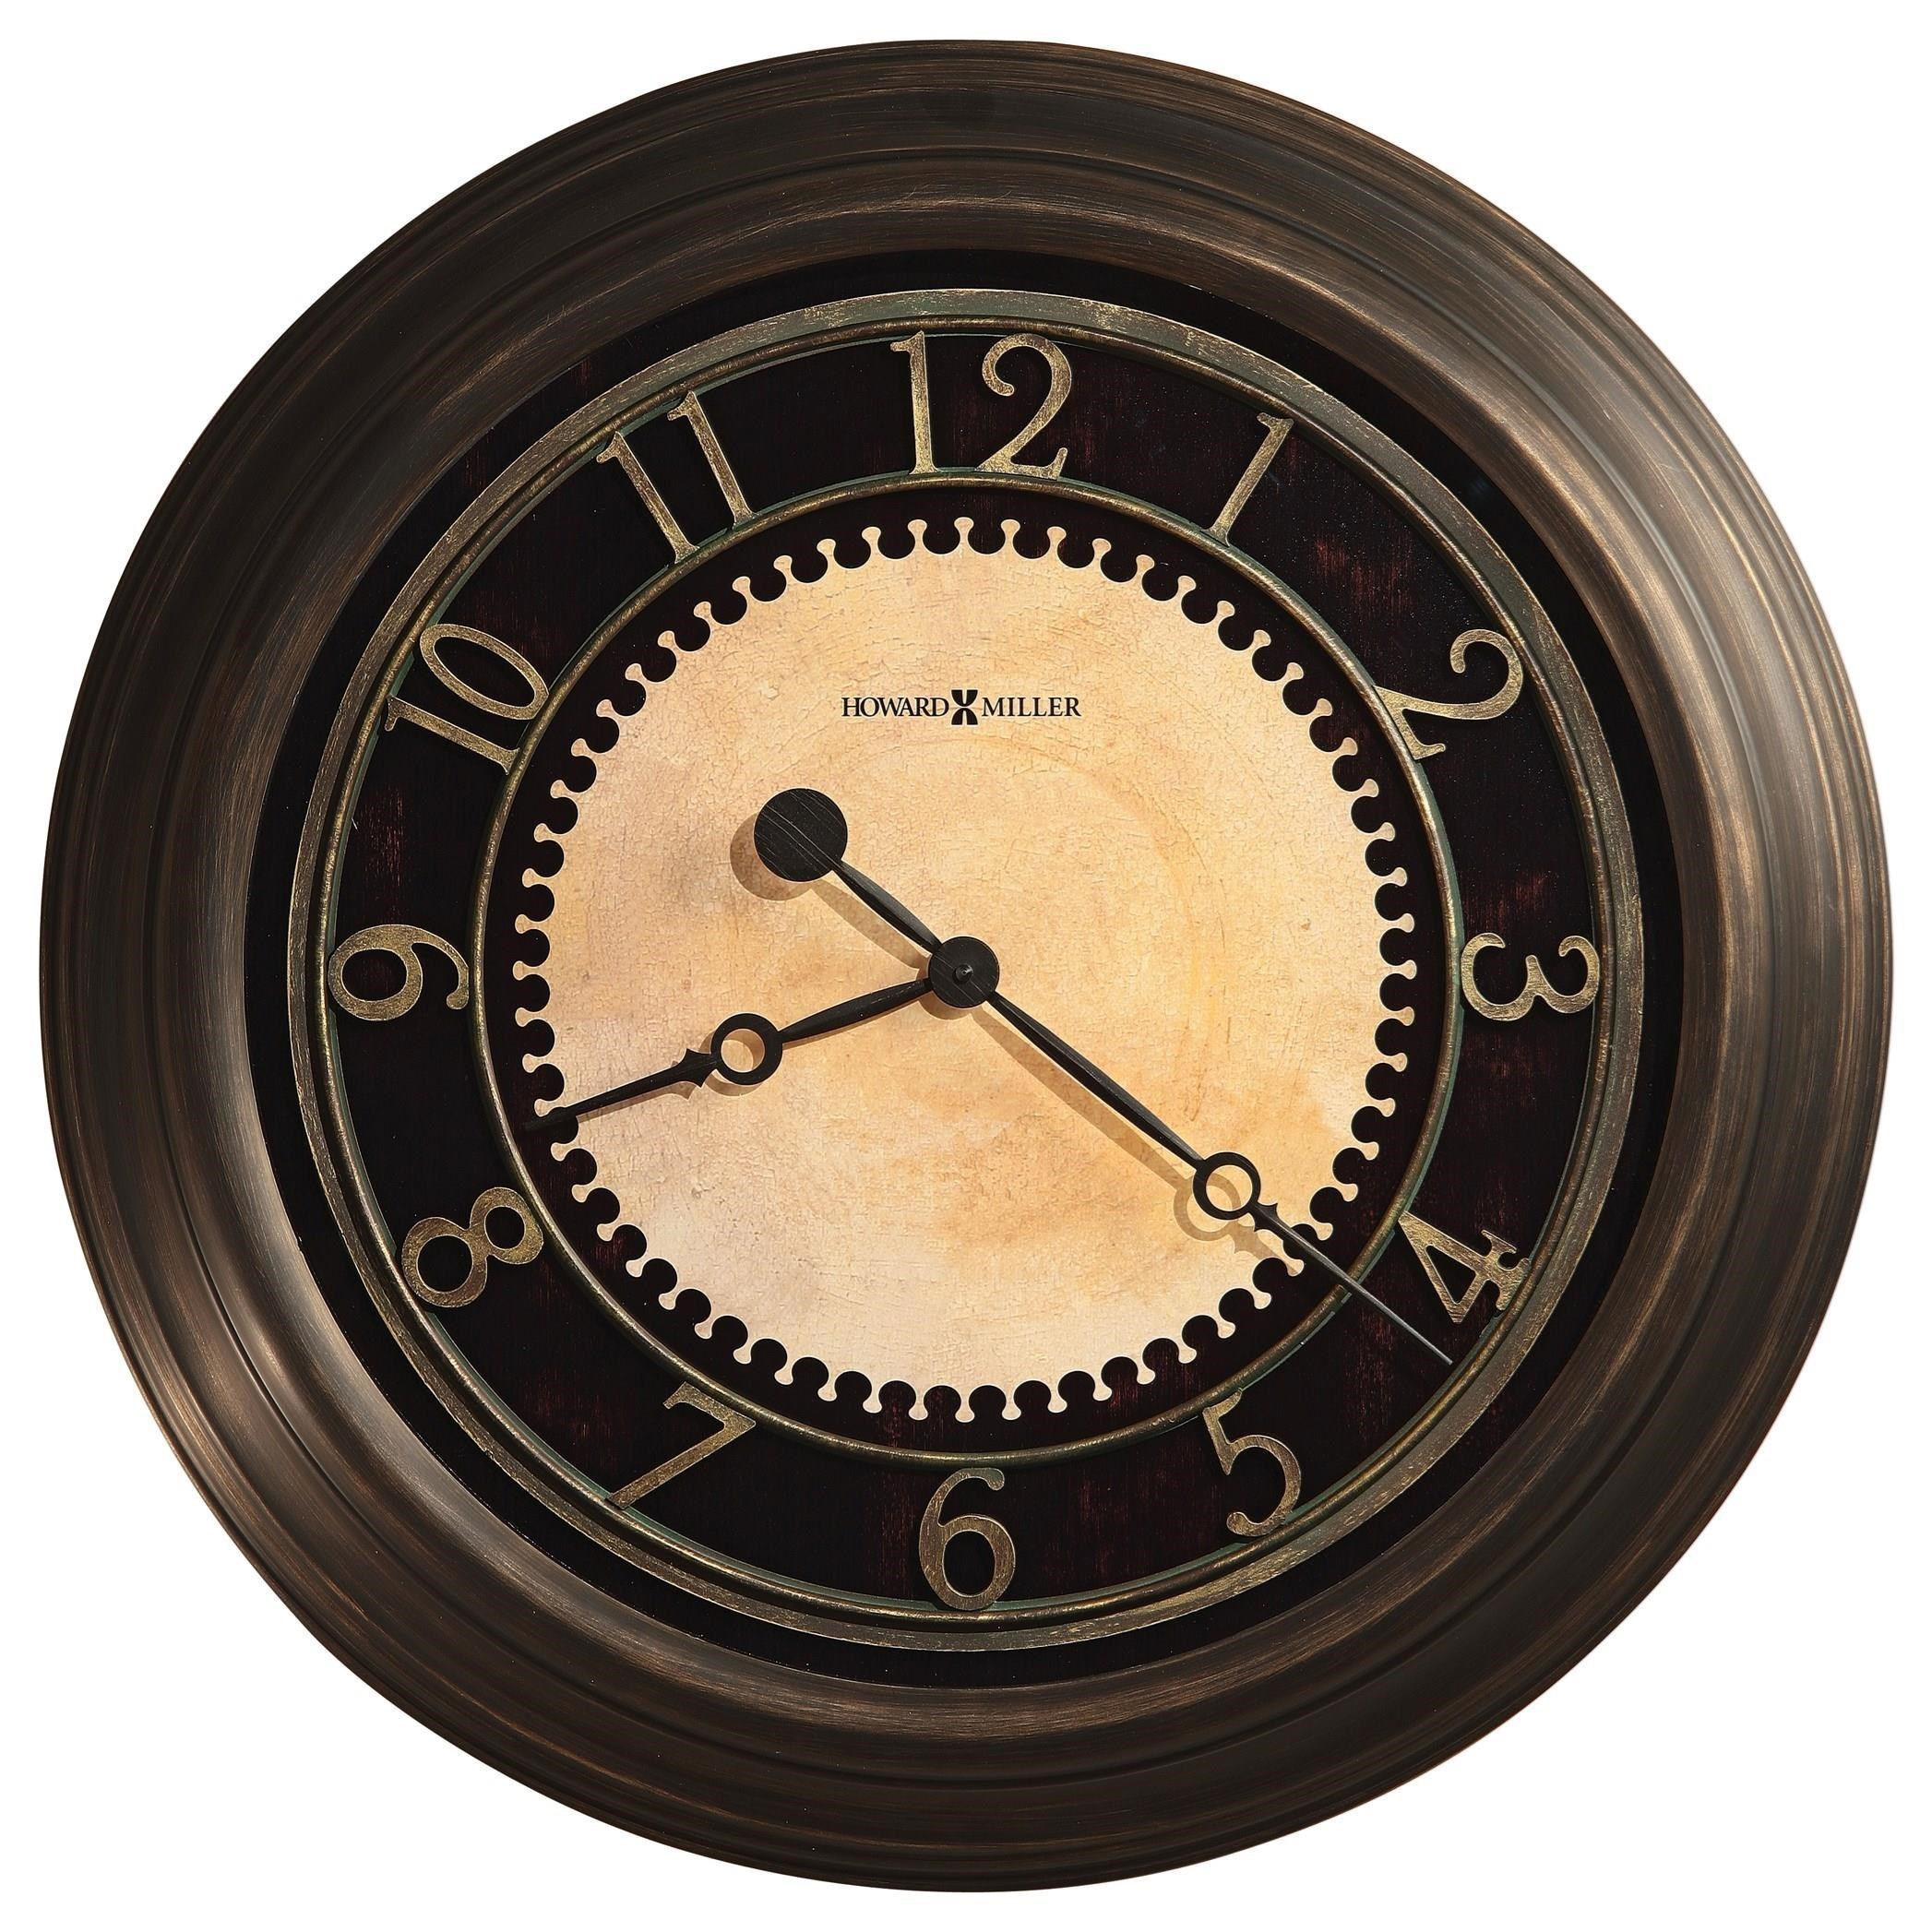 Wall Clocks Chadwick Wall Clock by Howard Miller at Lindy's Furniture Company